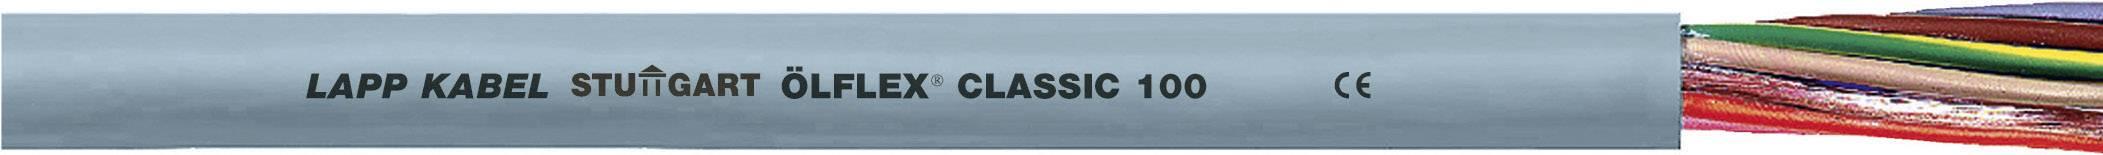 Kabel LappKabel Ölflex CLASSIC 100 25G0,75 (0010034), PVC, 13,8 mm, 500 V, šedá, 500 m